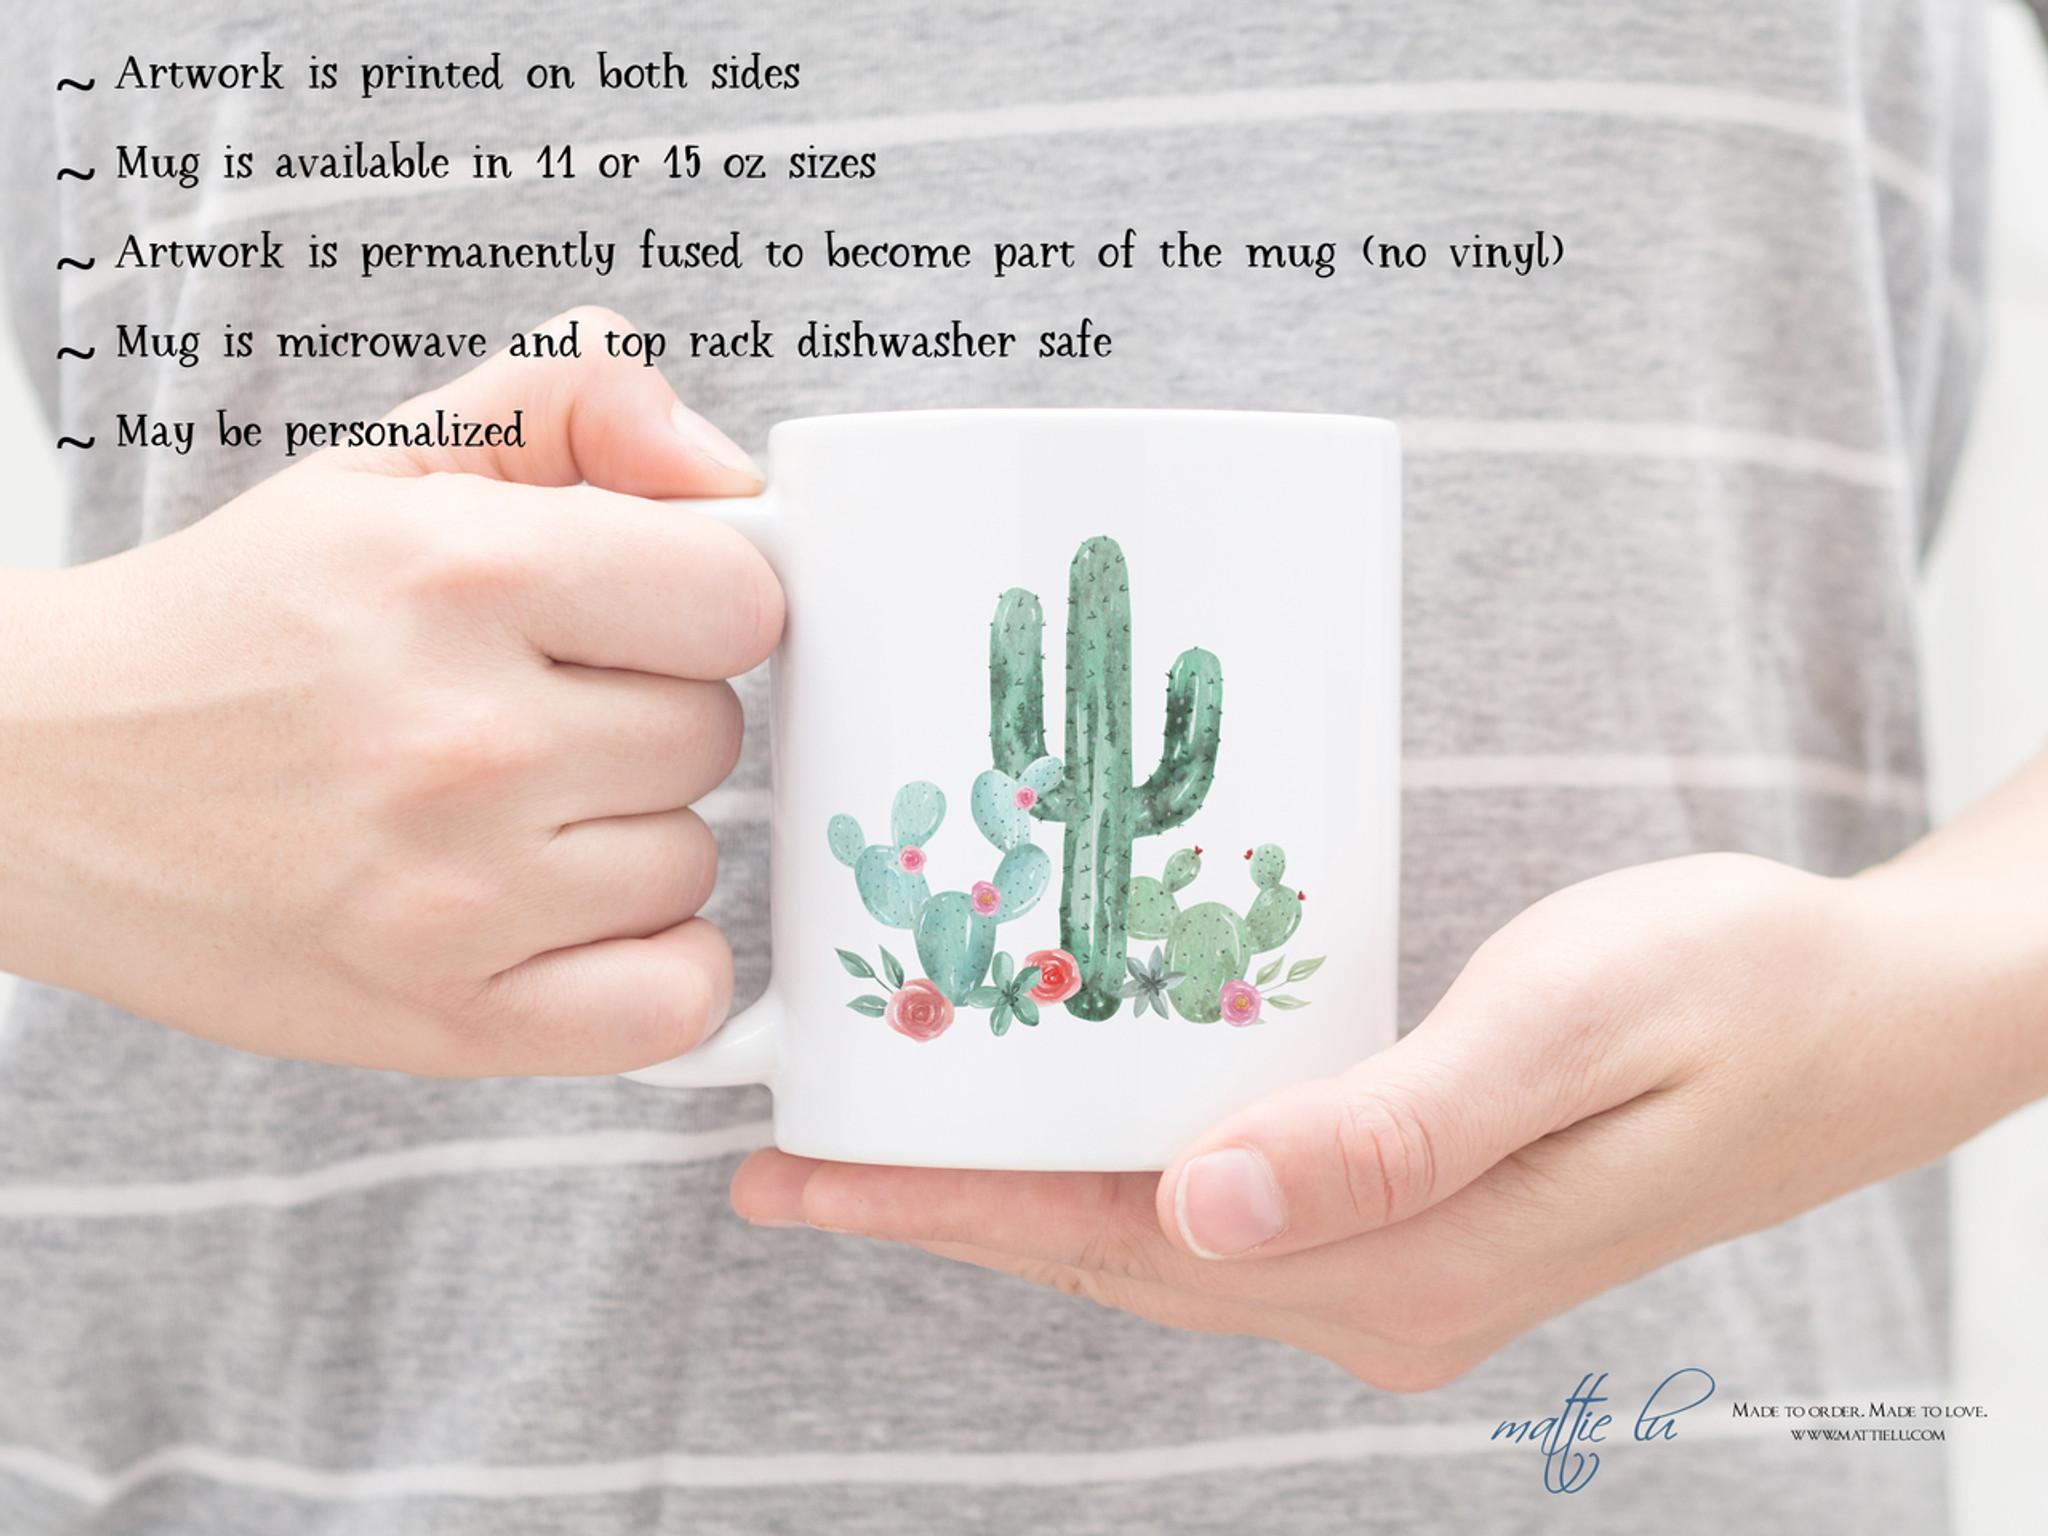 Gift Cactus Unique Coffee Custom Sets Personalized Mugs MugSucculent Lover Fan l3T1KFJc